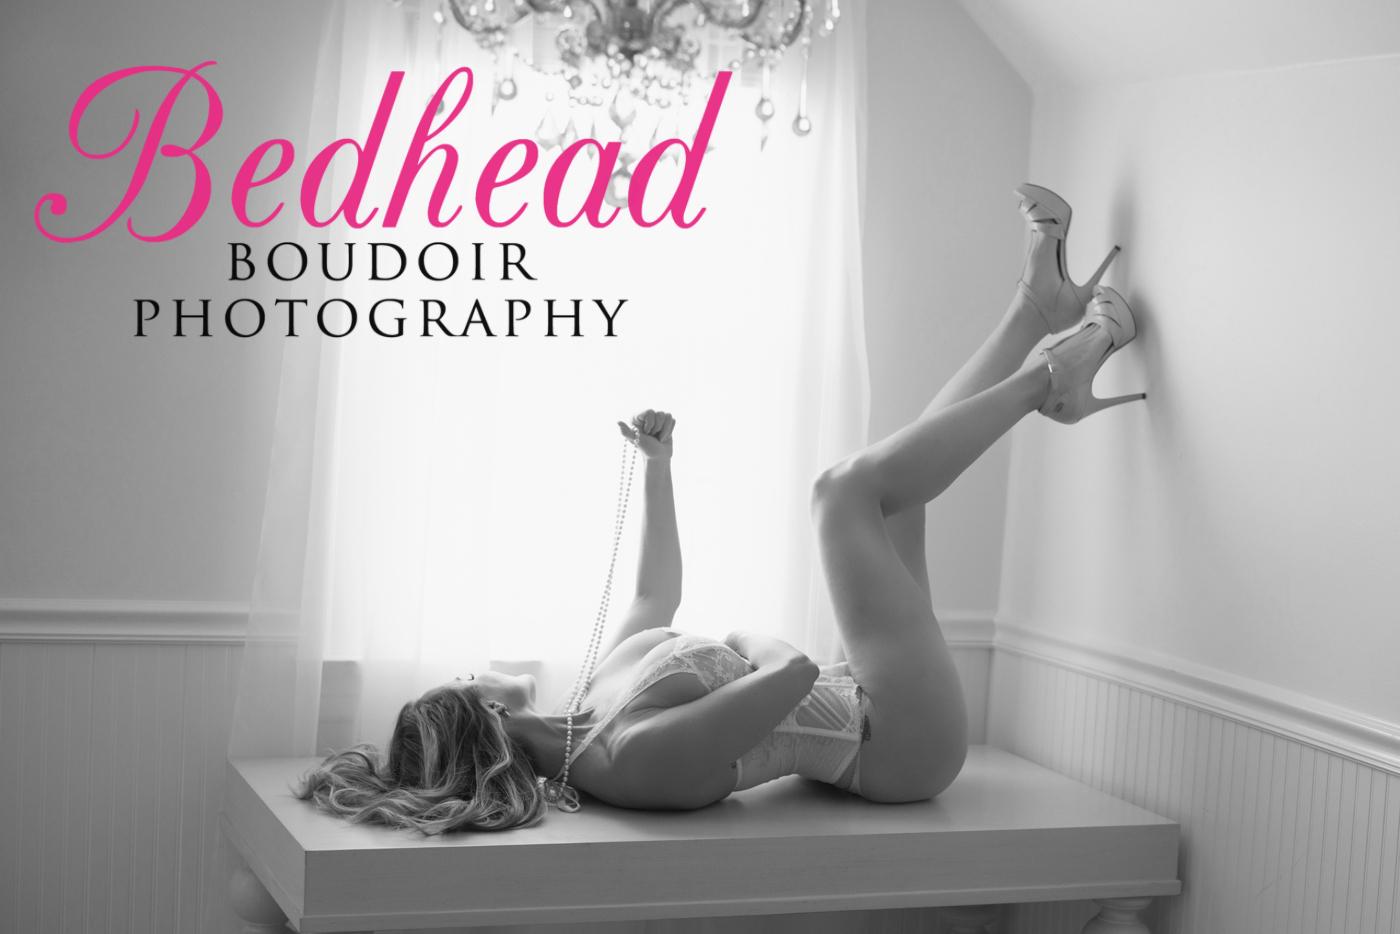 Bedhead_Boudoir_Photography_Chicago-4.jpg